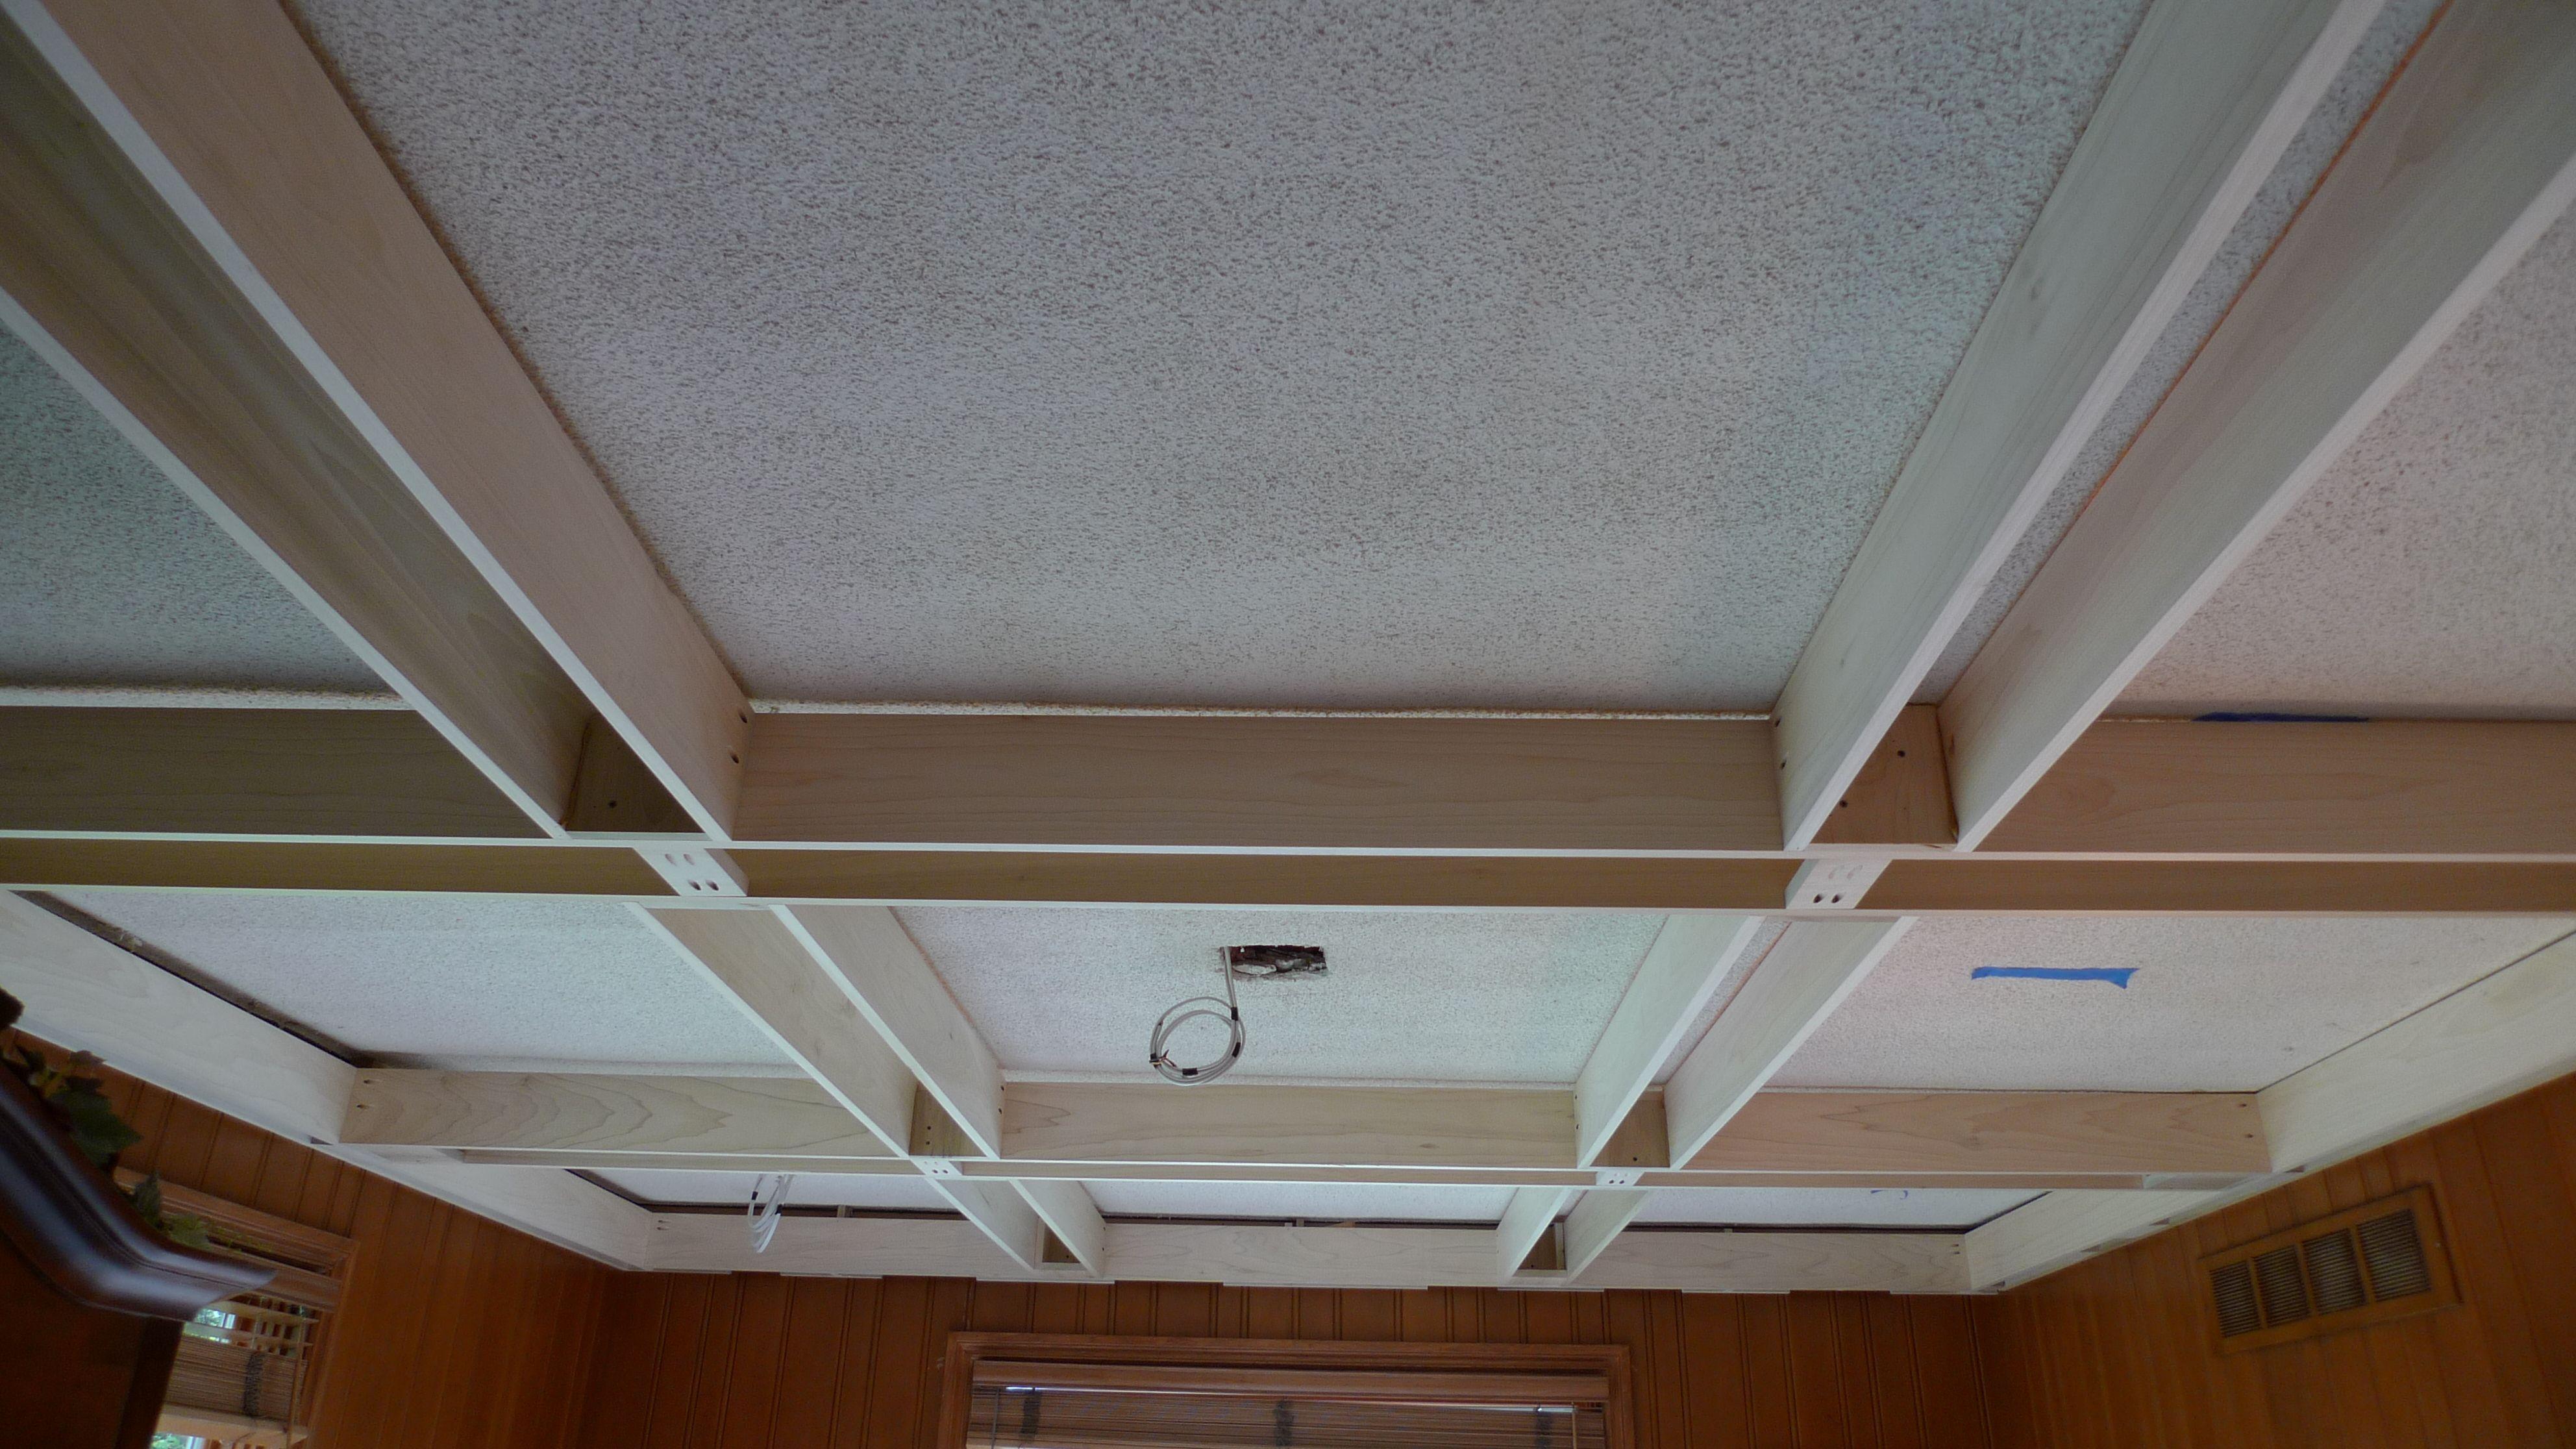 Poplar Coffered Ceiling Ceiling Ceiling Design Ceiling